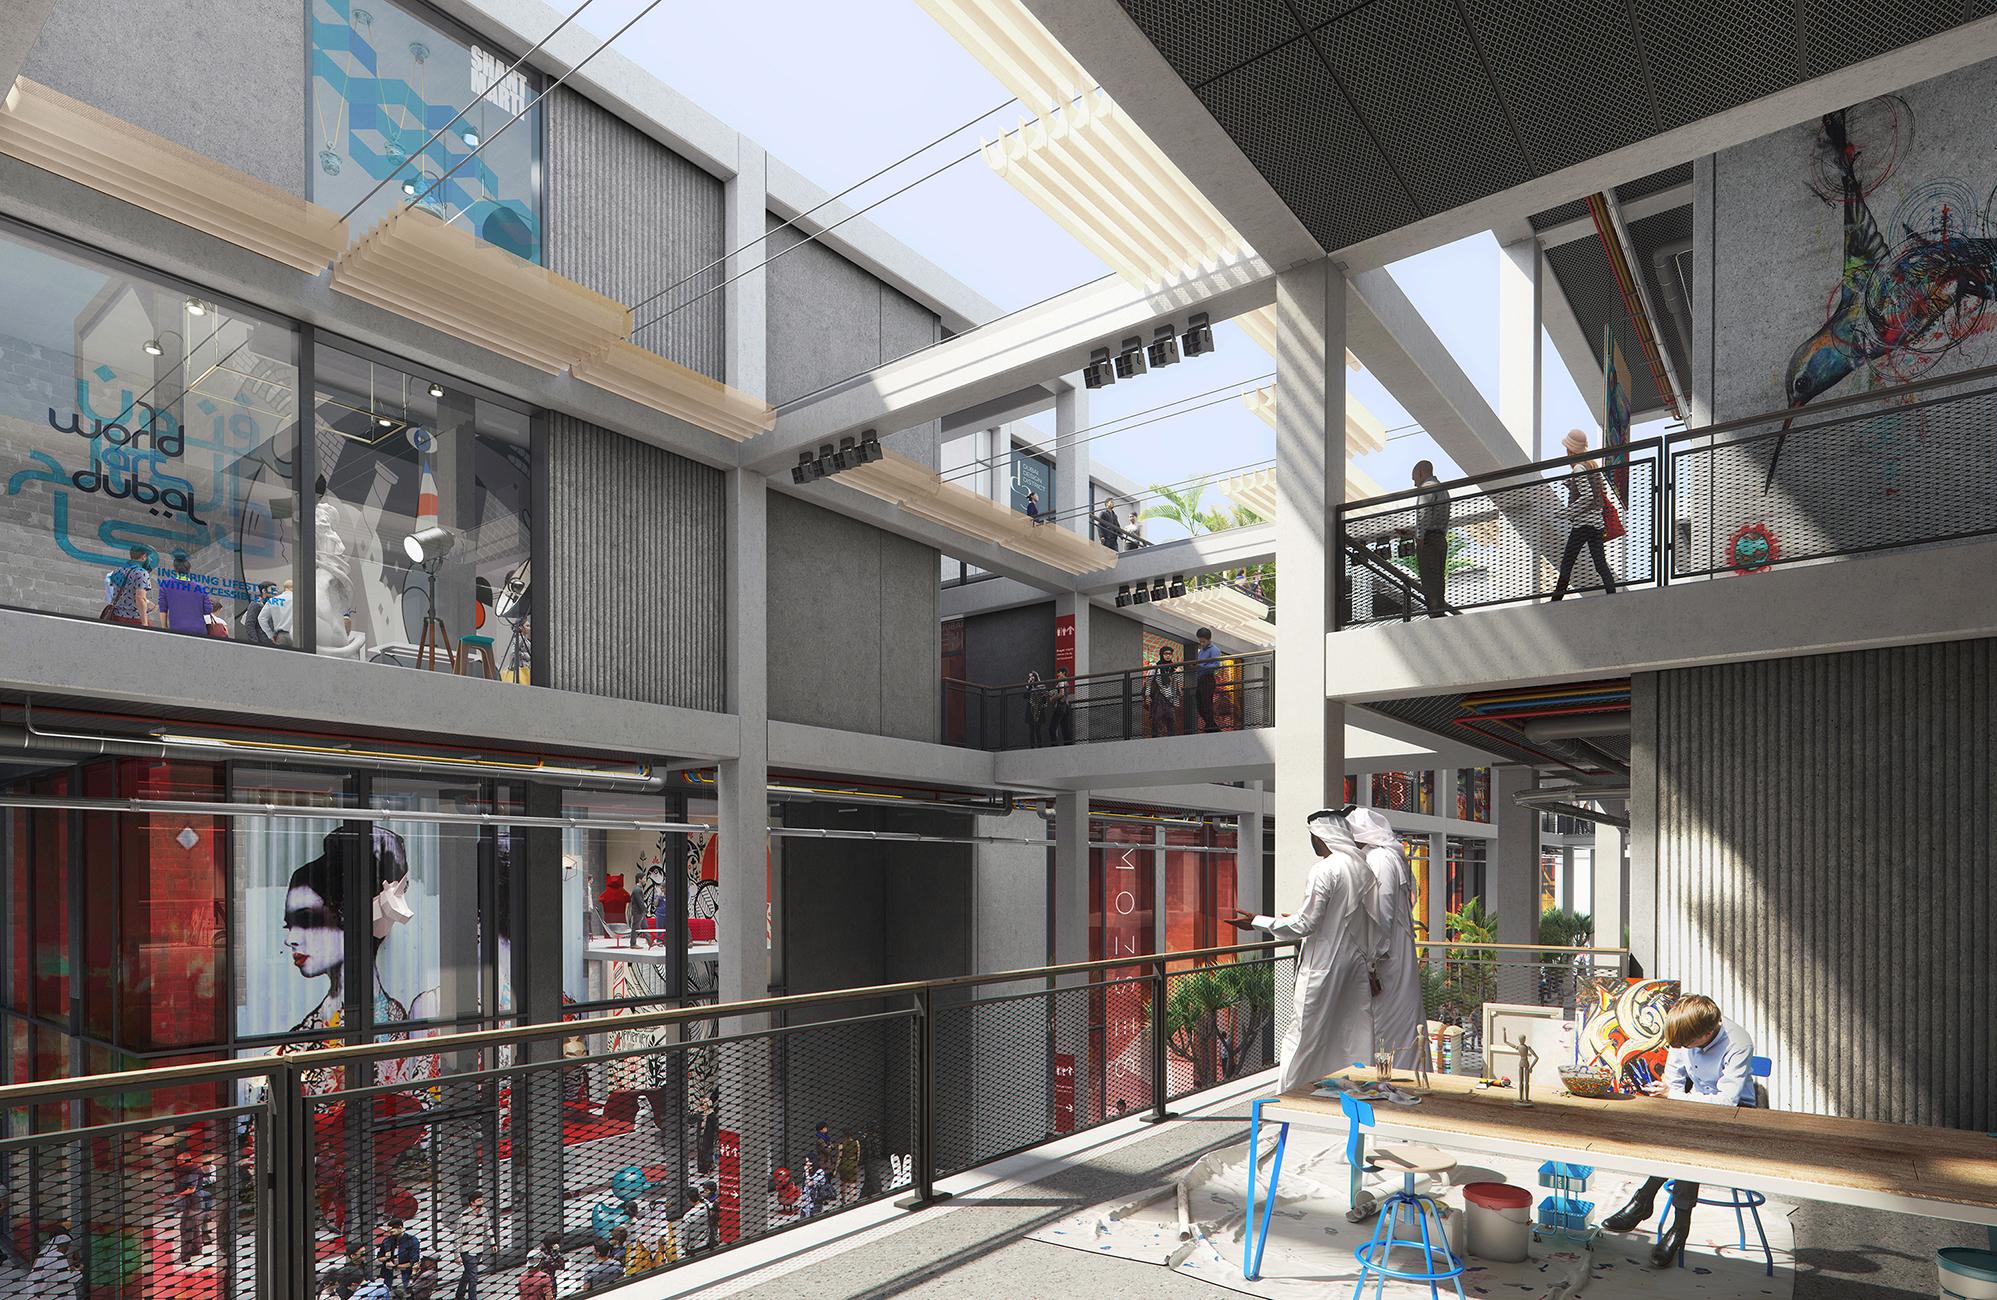 D3 - DesignDistrict - CreativeClusters - Dubai - op1.jpg